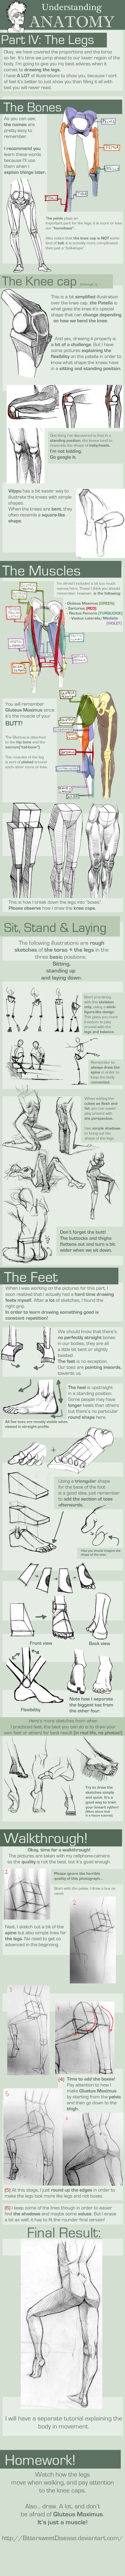 Understanding anatomy - legs